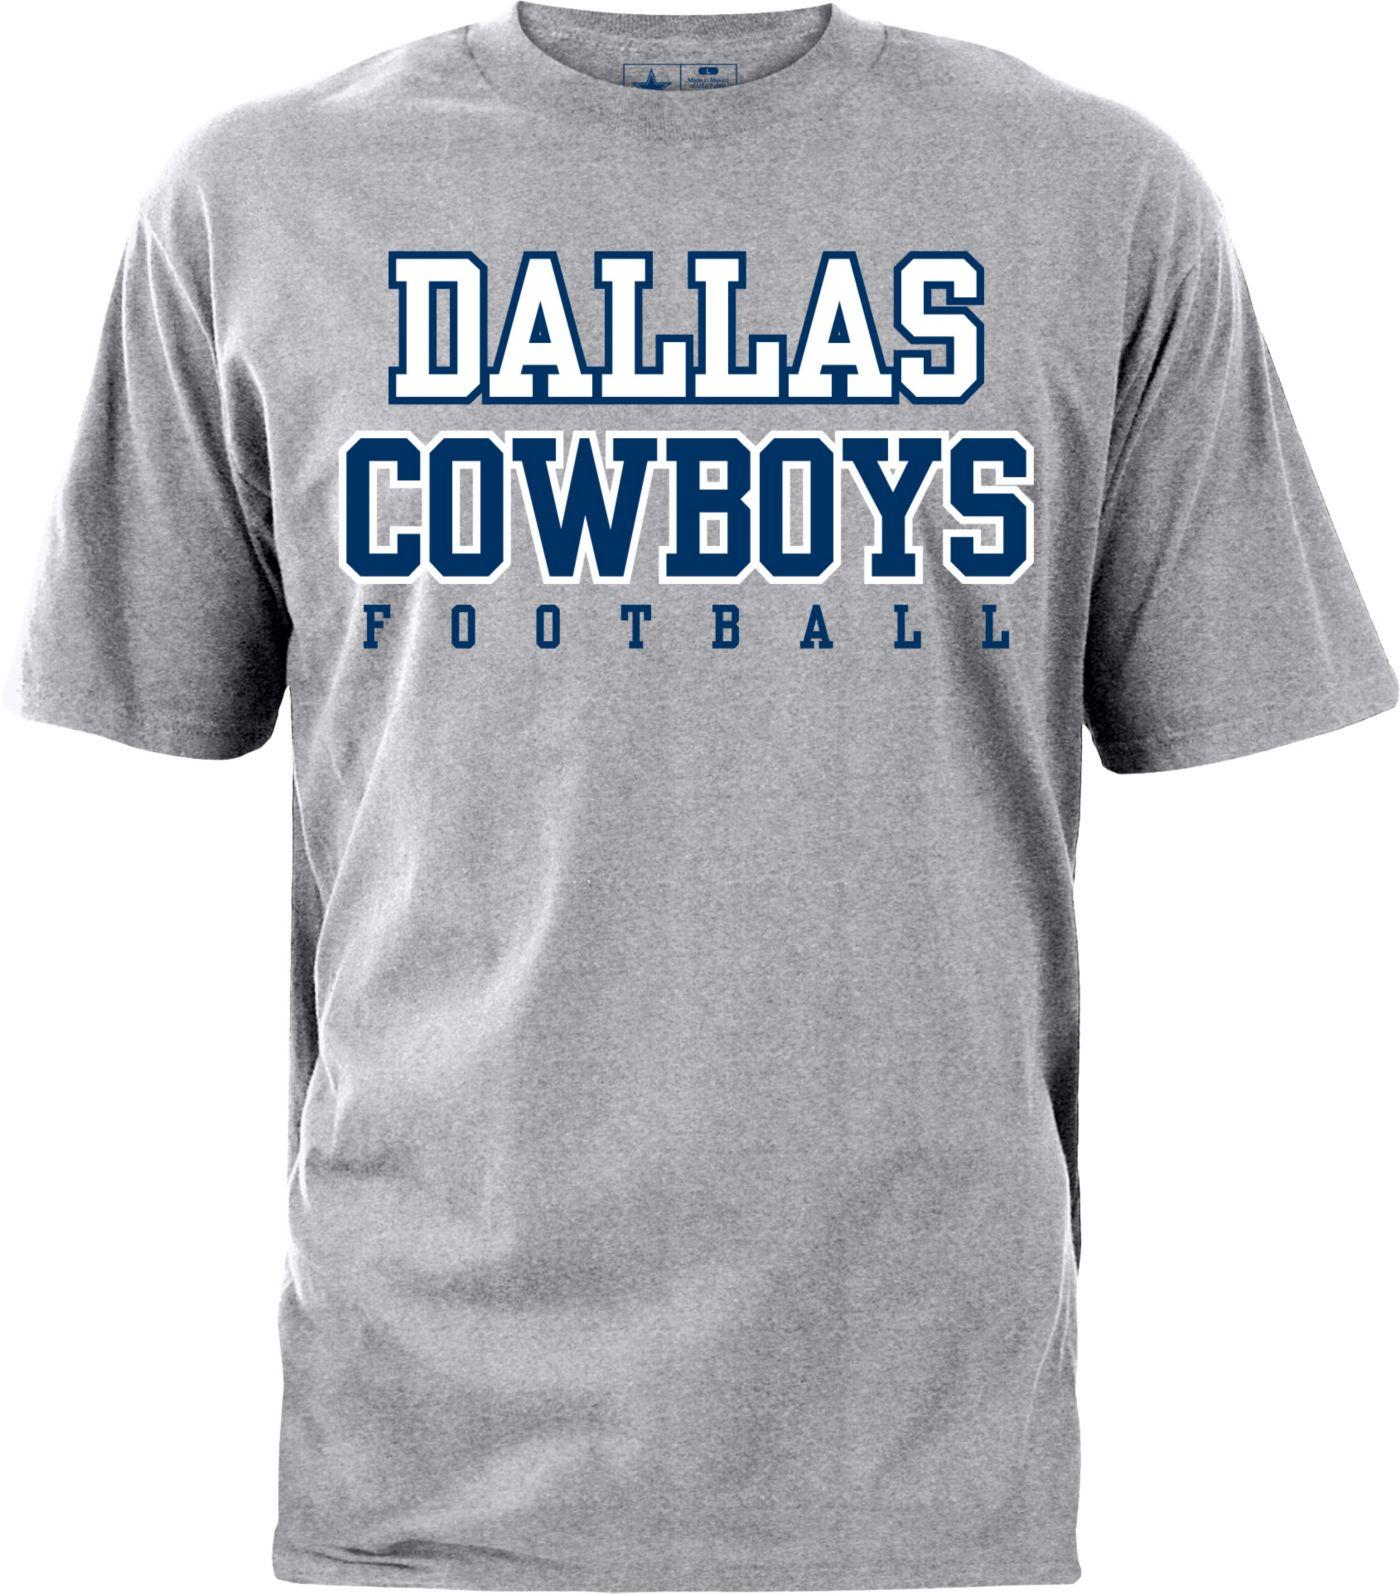 Dallas Cowboys Merchandising Men's Practice Grey T-Shirt